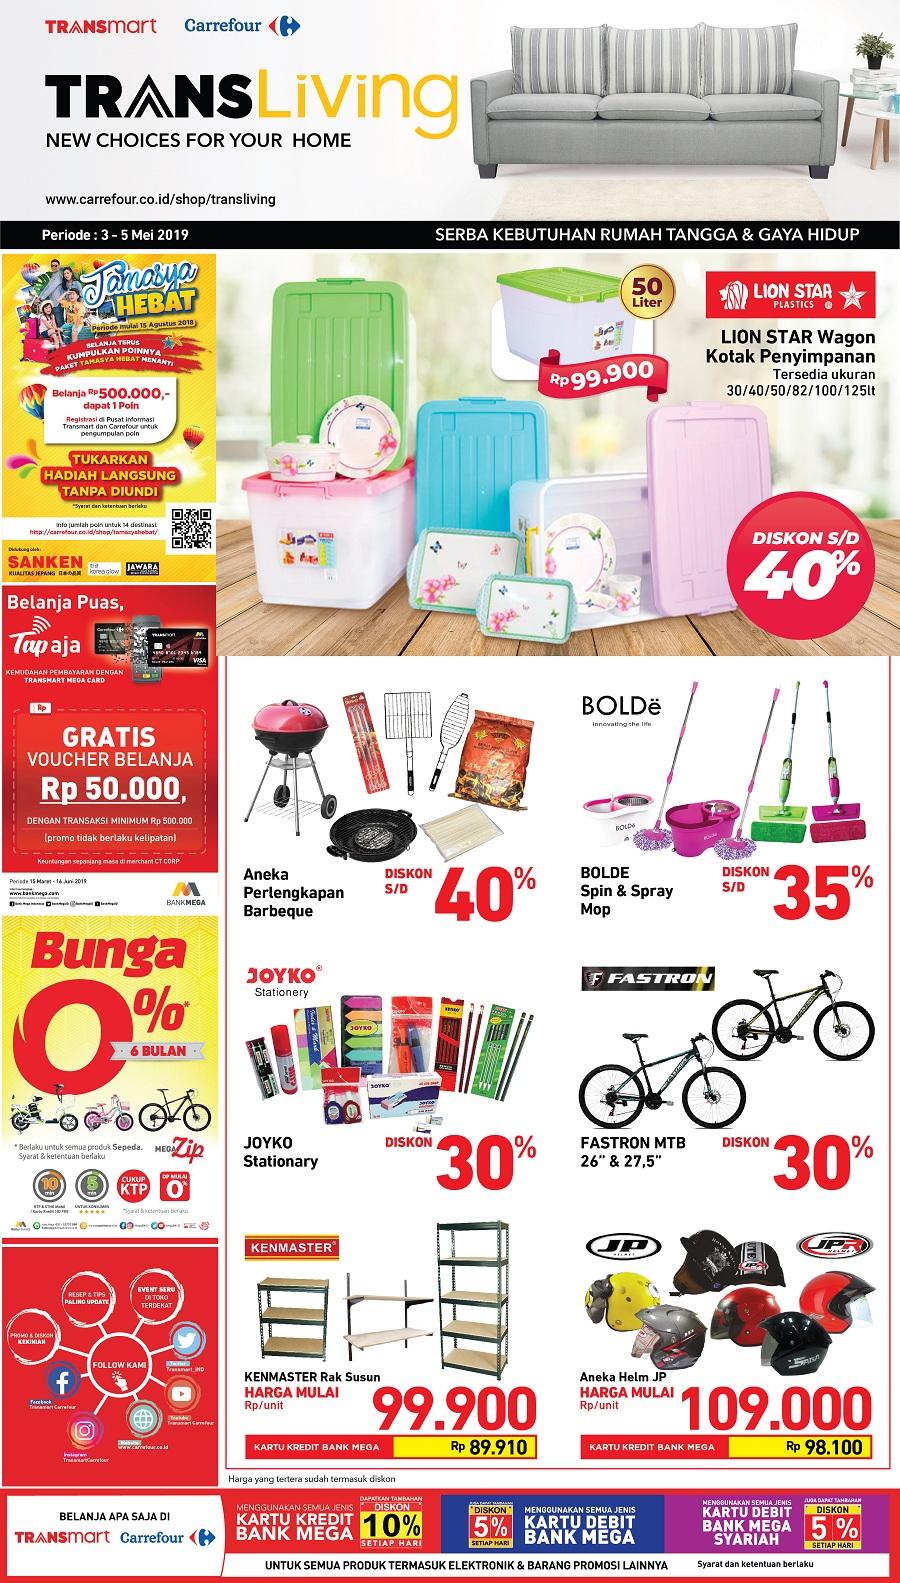 #Transmart #Carrefour - #Promo #Katalog Weekend Periode 03 - 09 Mei 2019